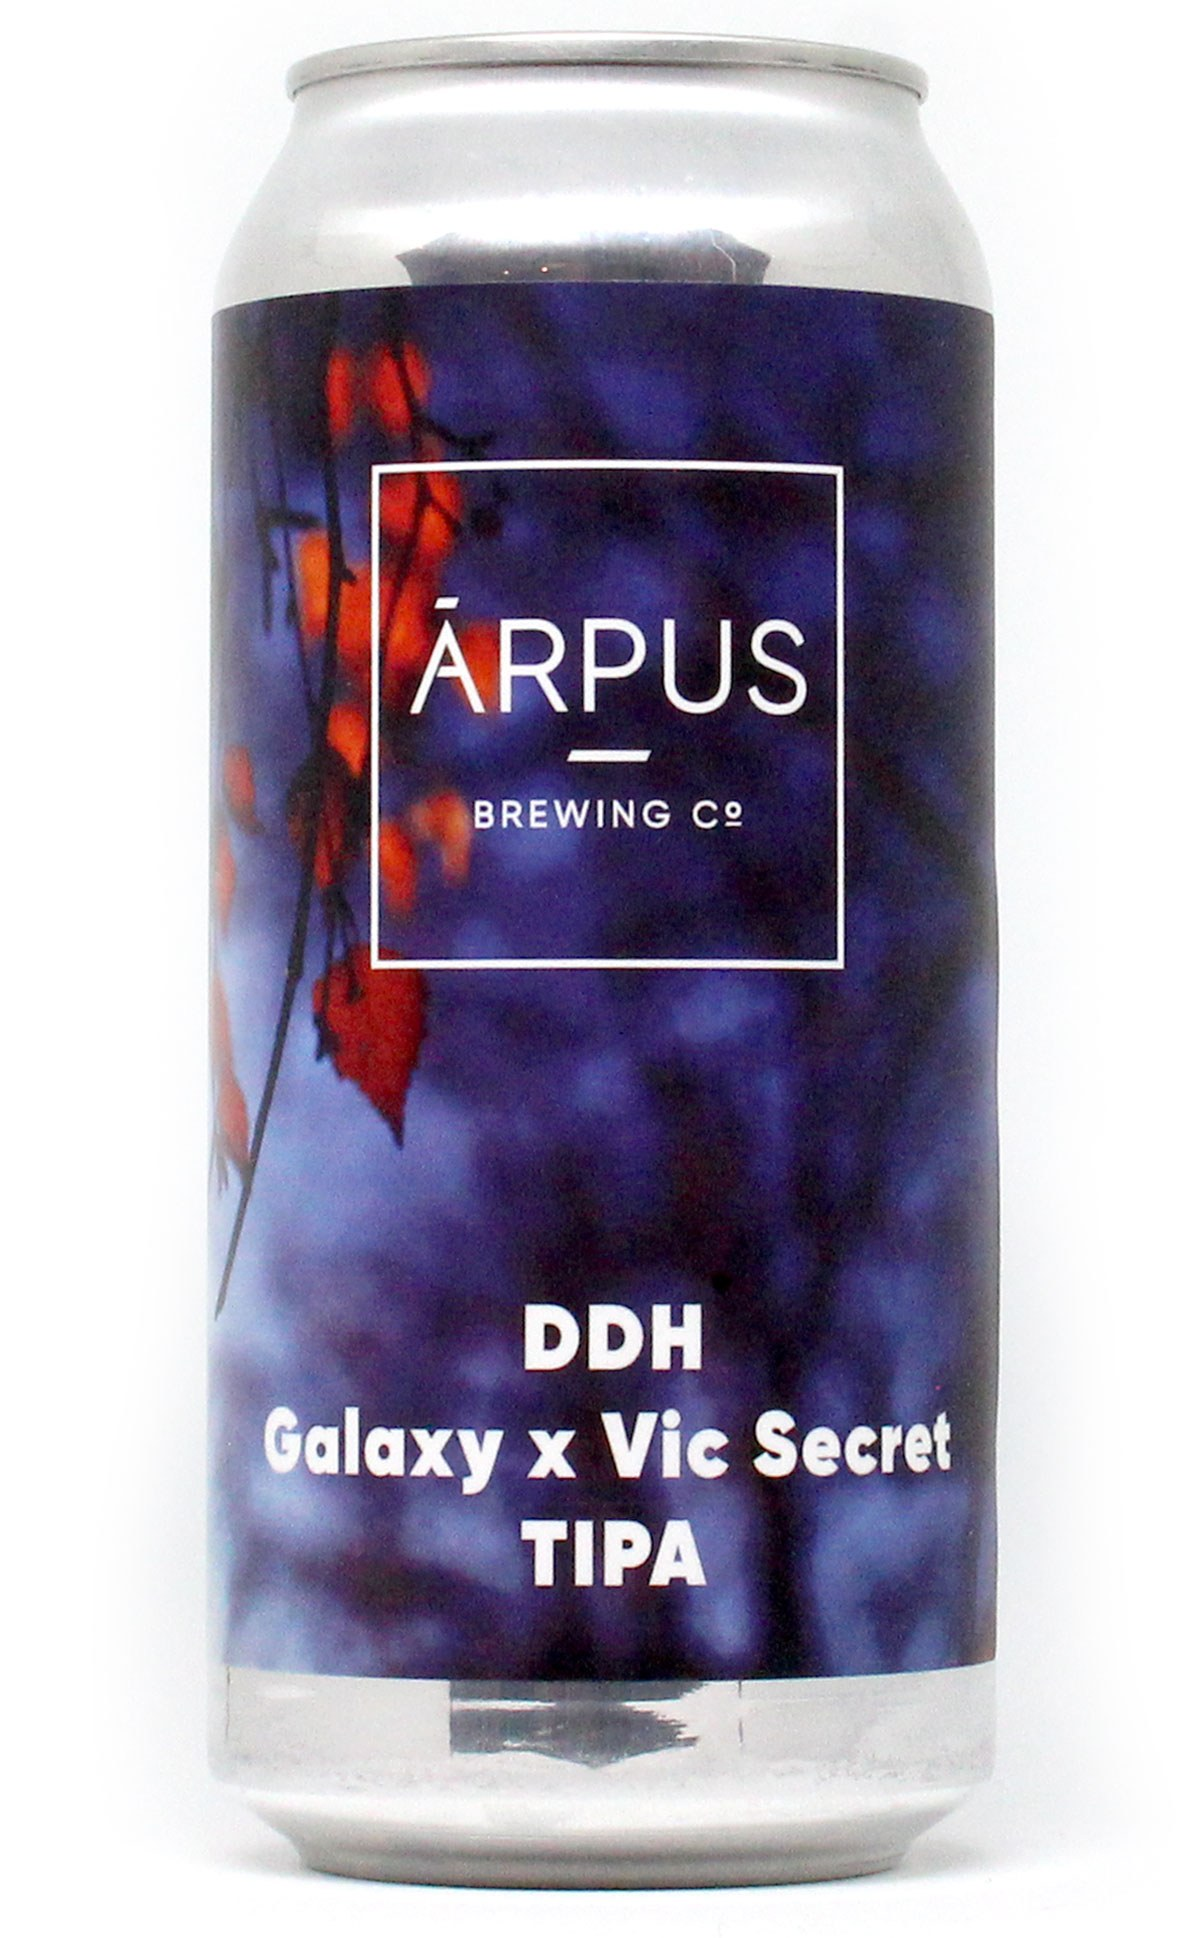 DDH Galaxy x Vic Secret TIPA